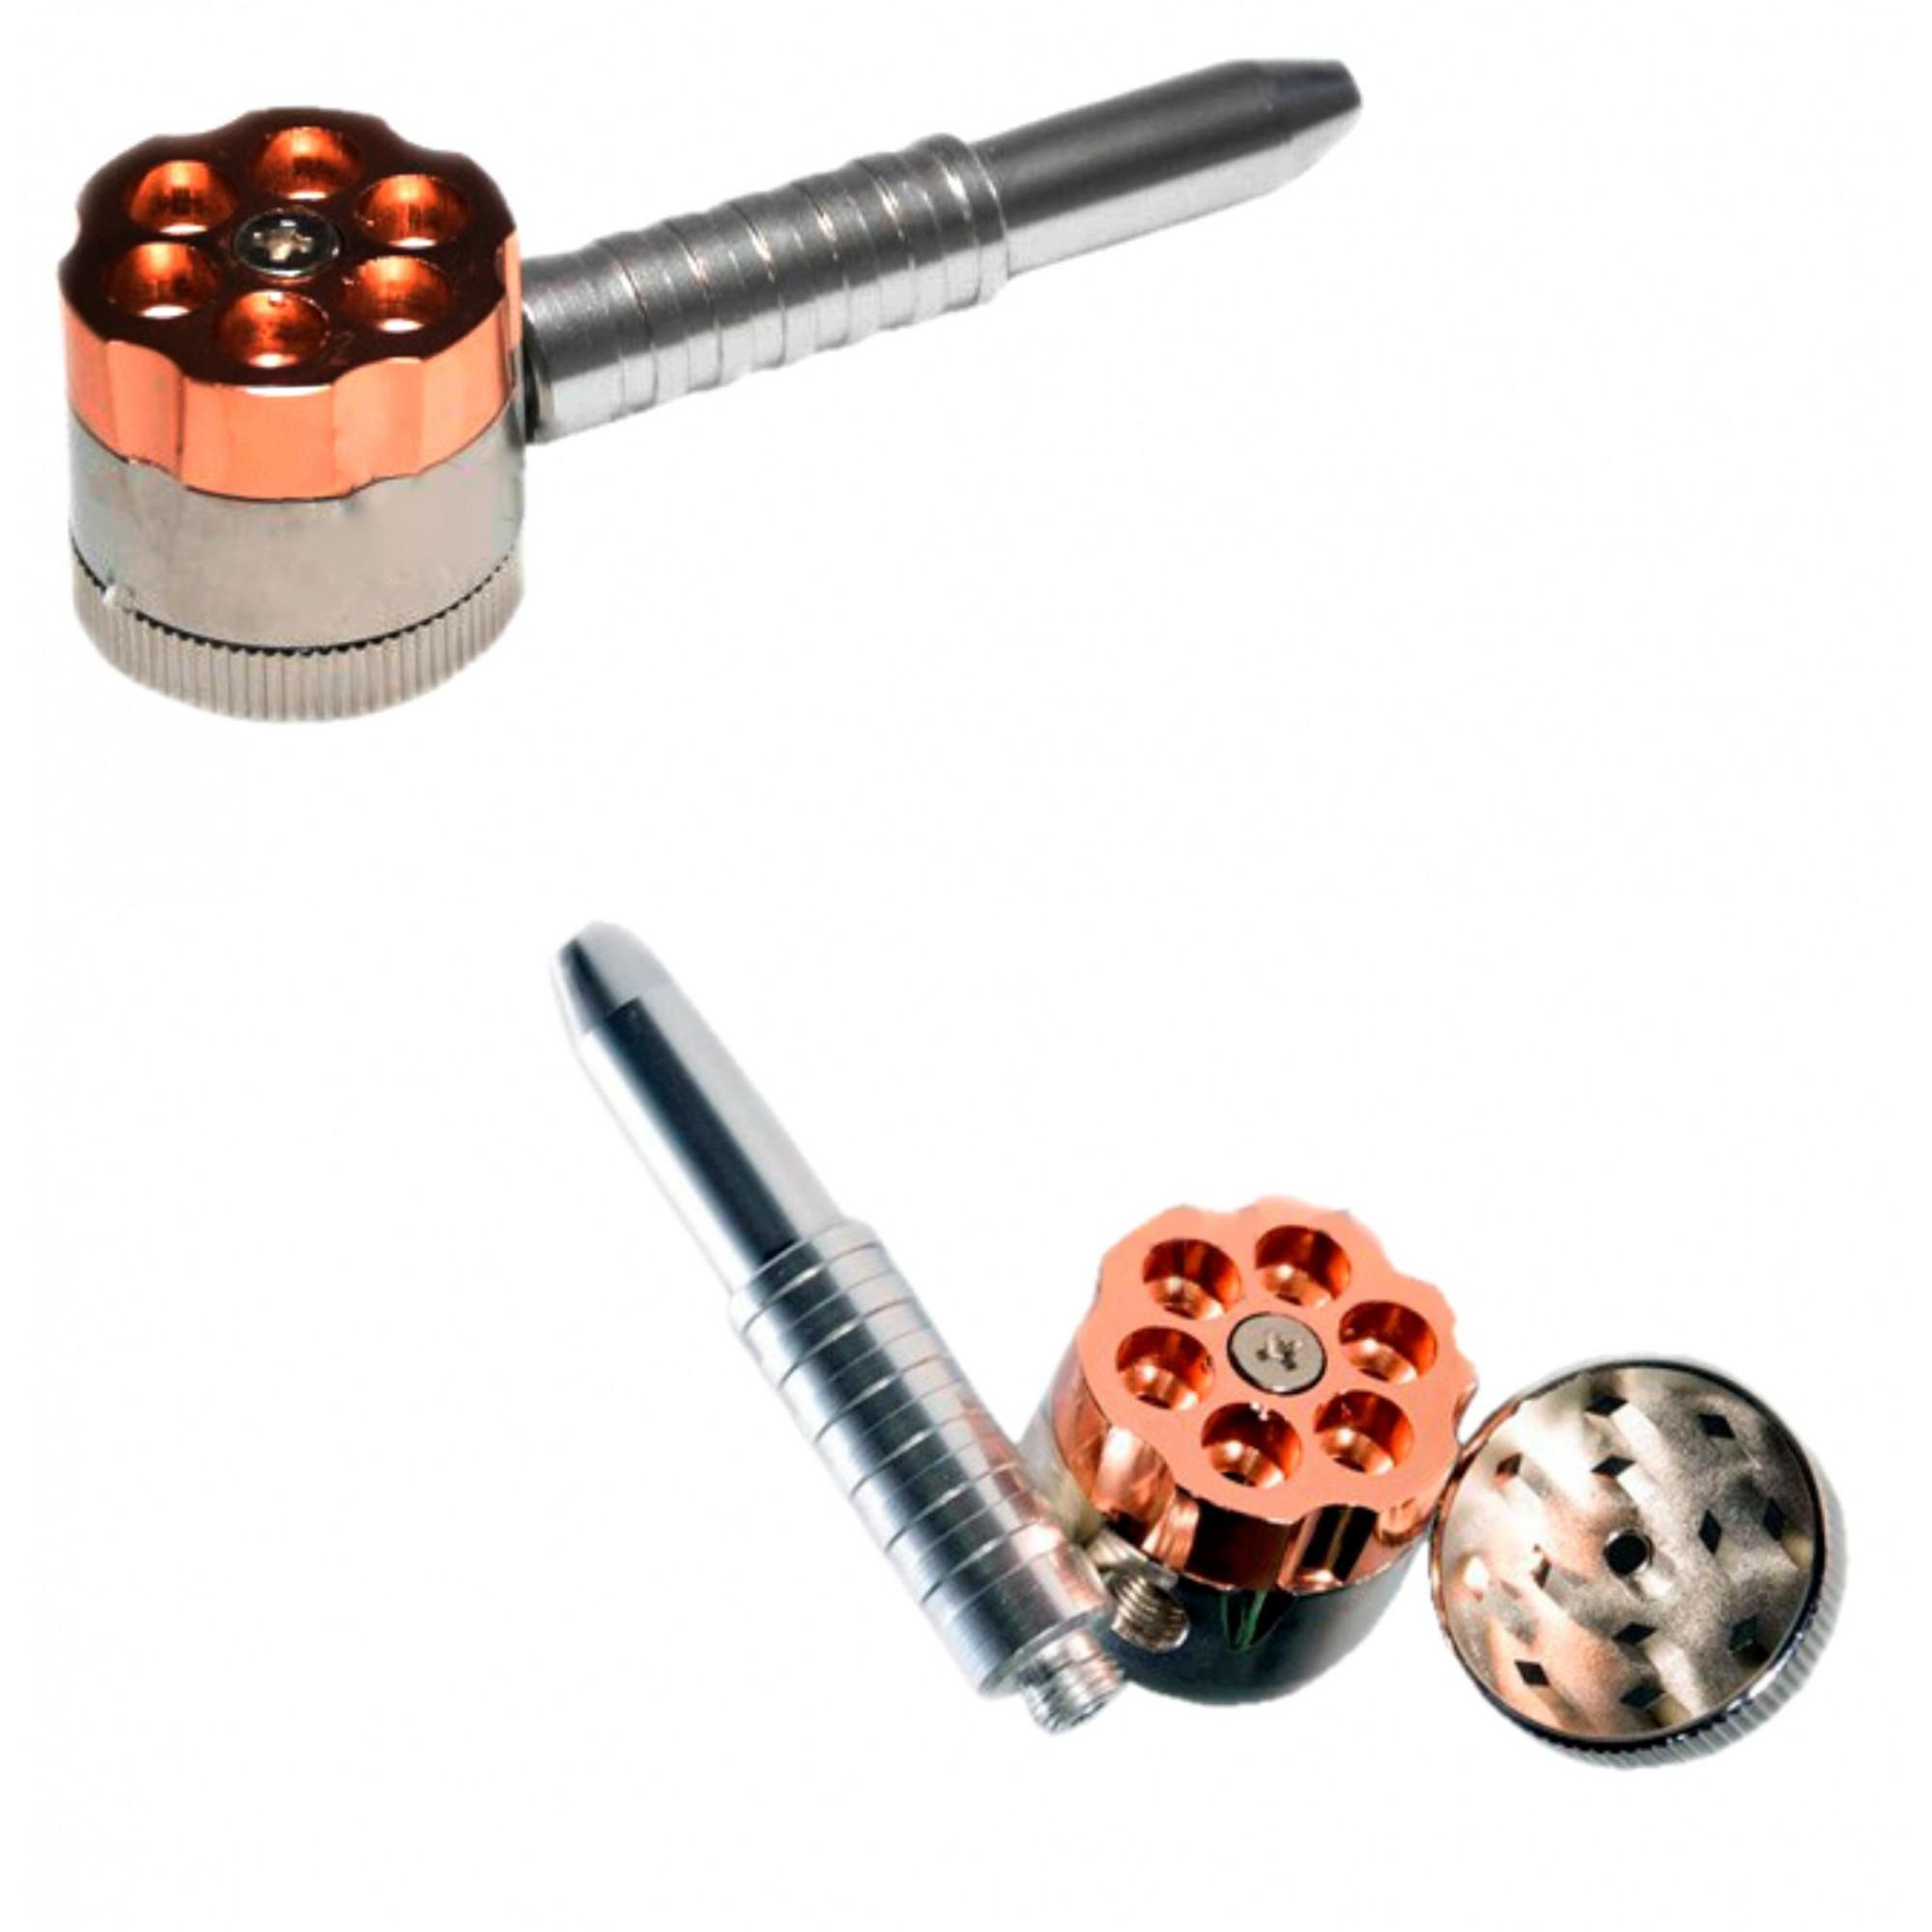 Pipe de metal e Dichavador - Tambor Revolver (Sortido)